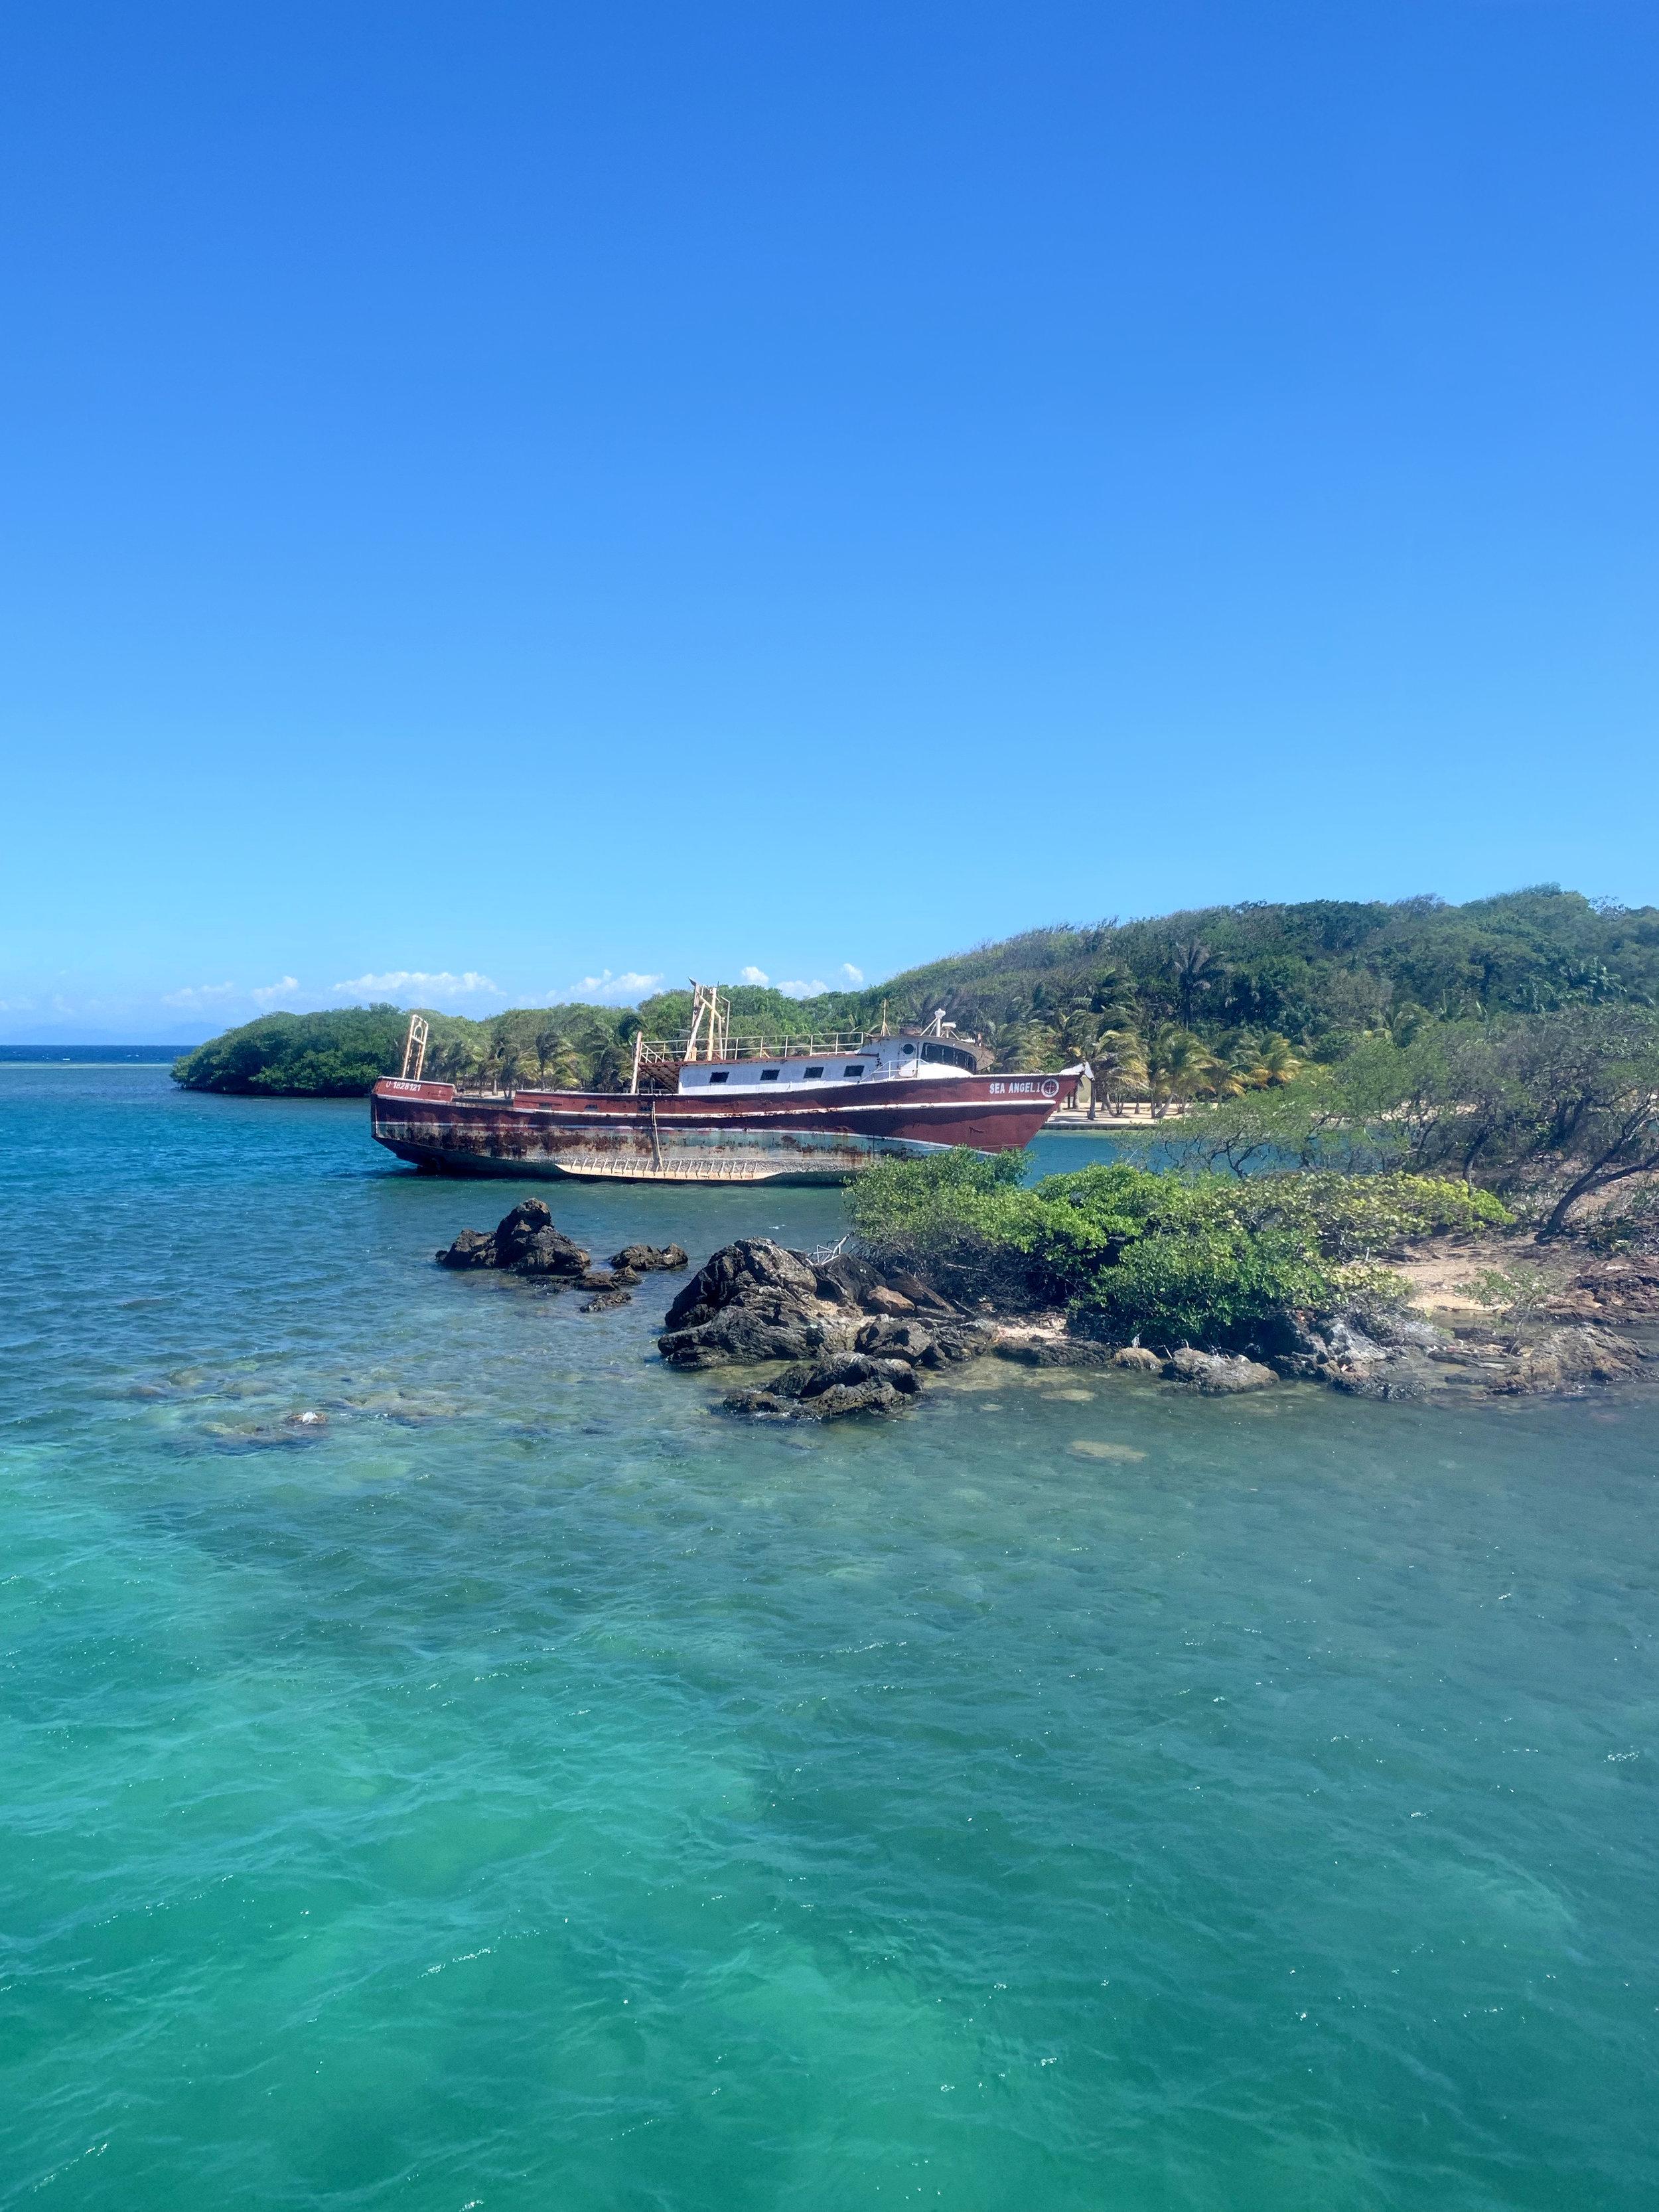 Decaying ship vessel off of the beach of Roatan, Honduras